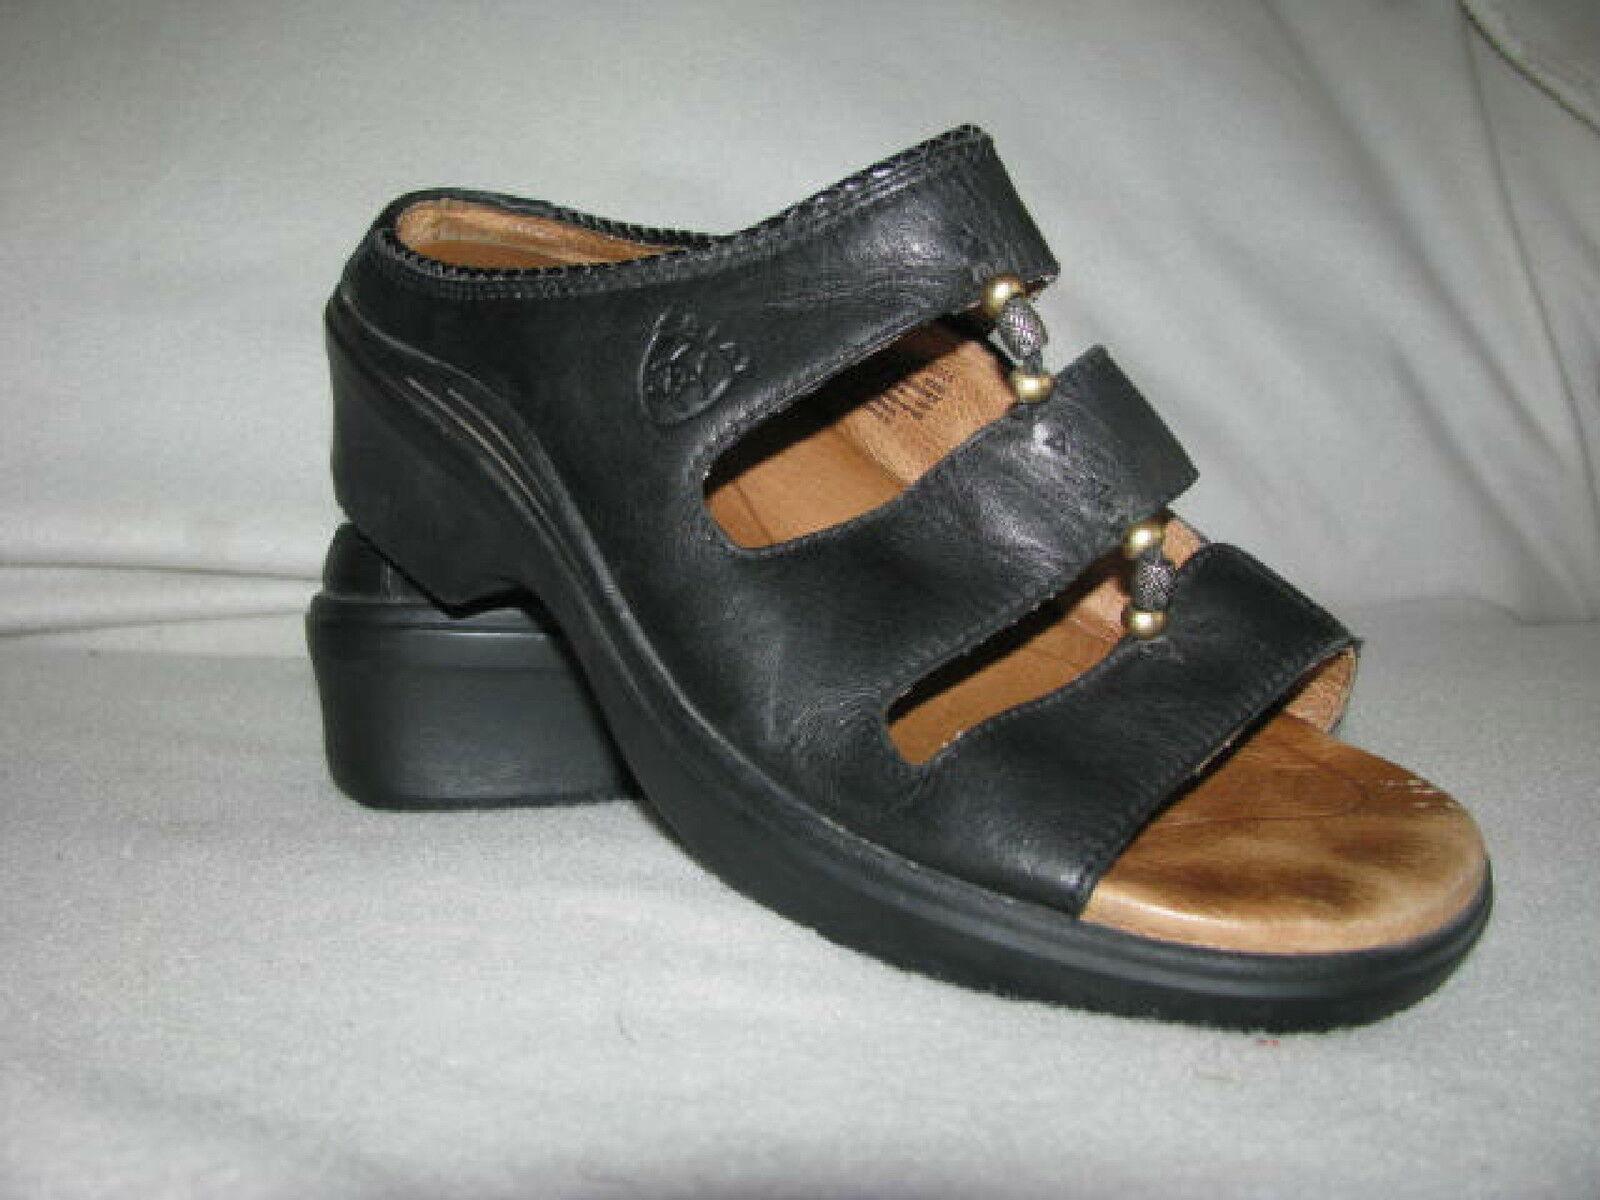 ARIAT 96205 WOM 9 B Black Leather 3 Strap Slip On Sandals Slides Comfort